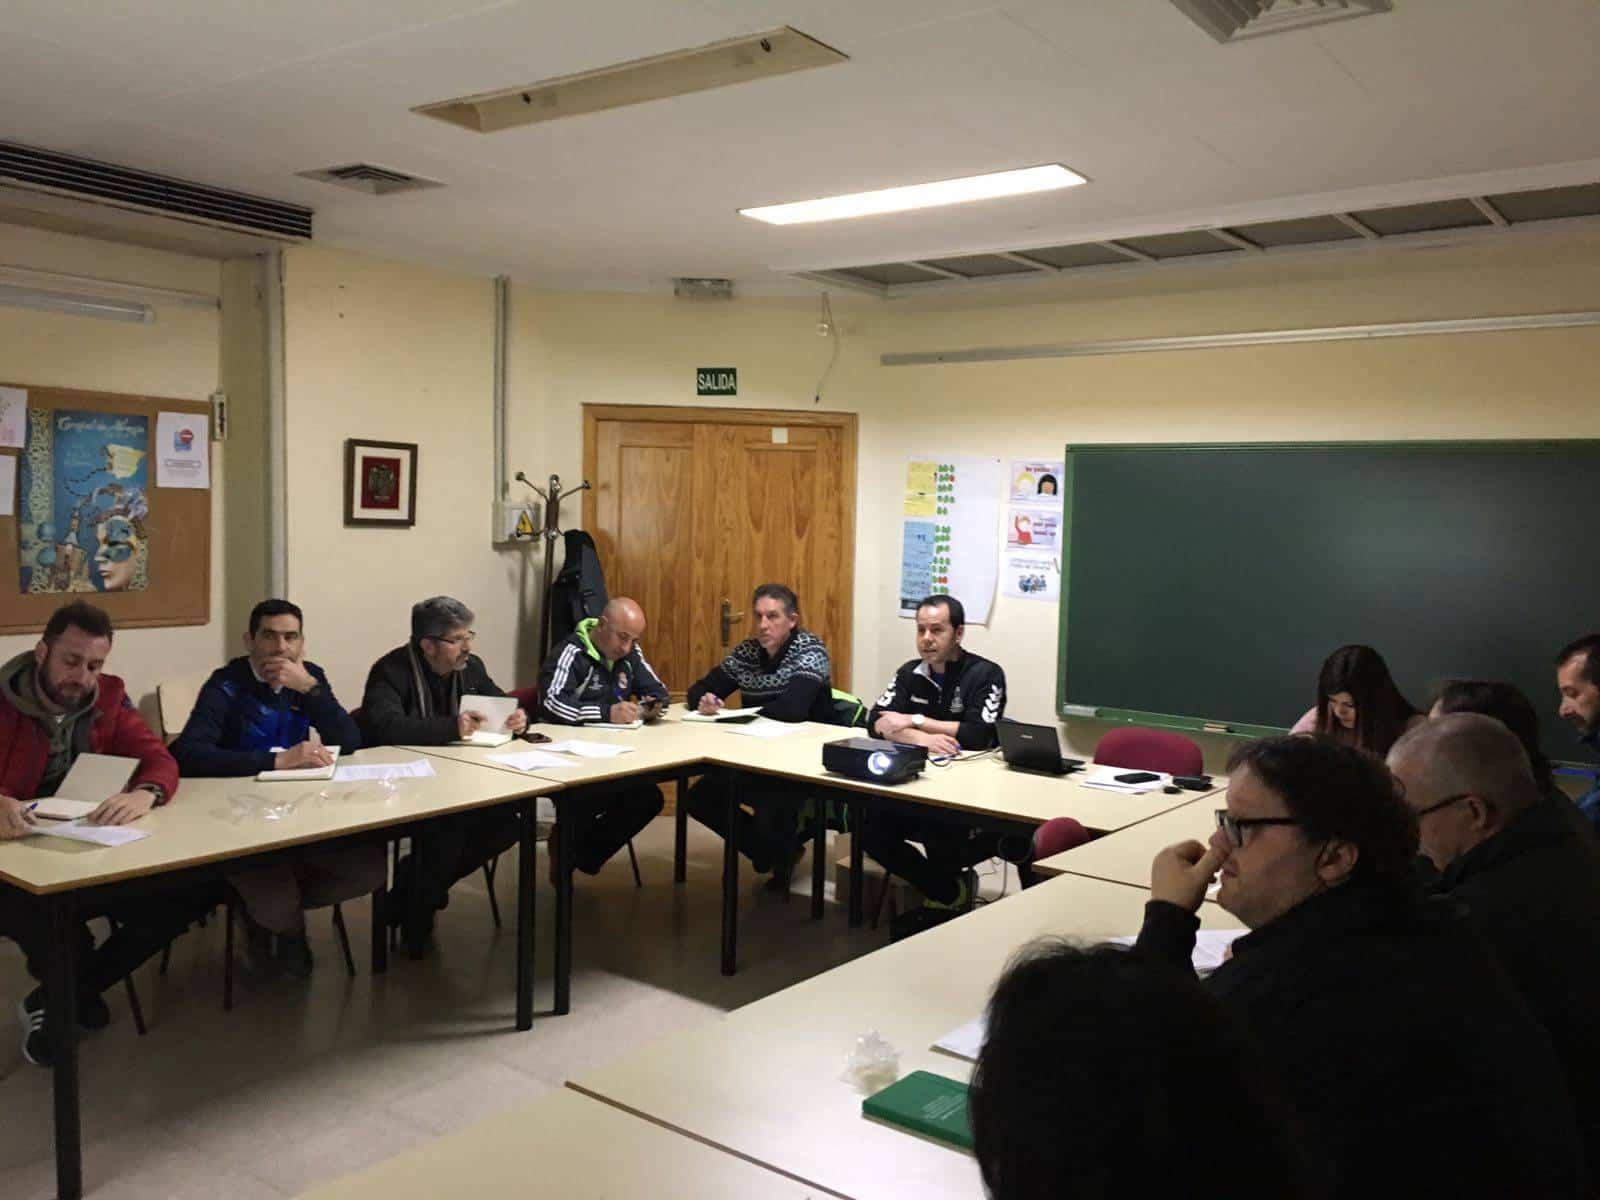 reunion consejo local deporte herencia 1 - Celebrado el Consejo Local del Deporte en Herencia